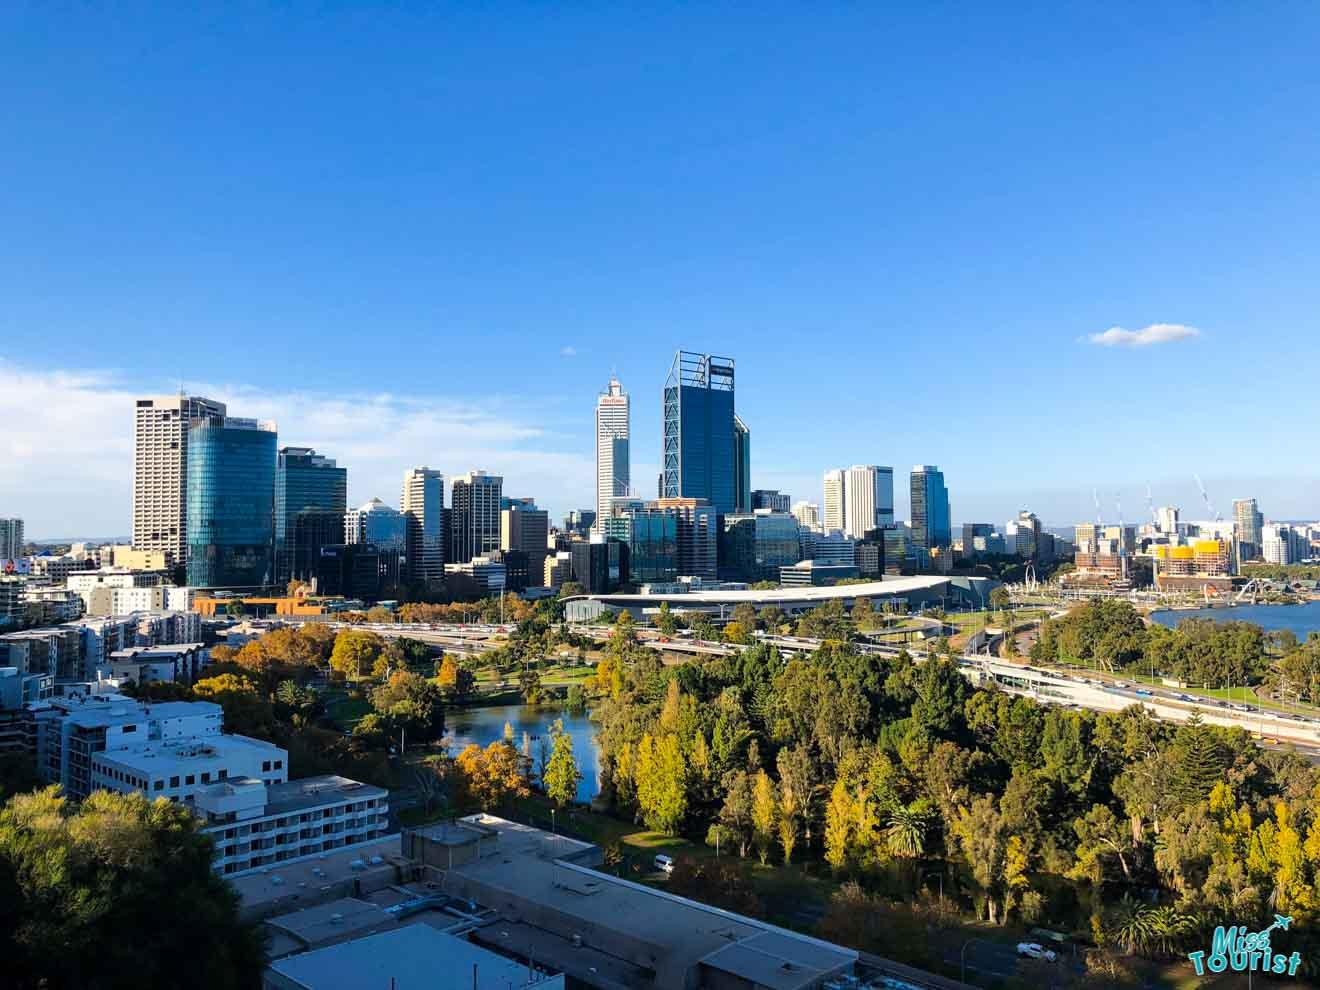 planificador de viaje a wa - Perth Western Australia Road trip